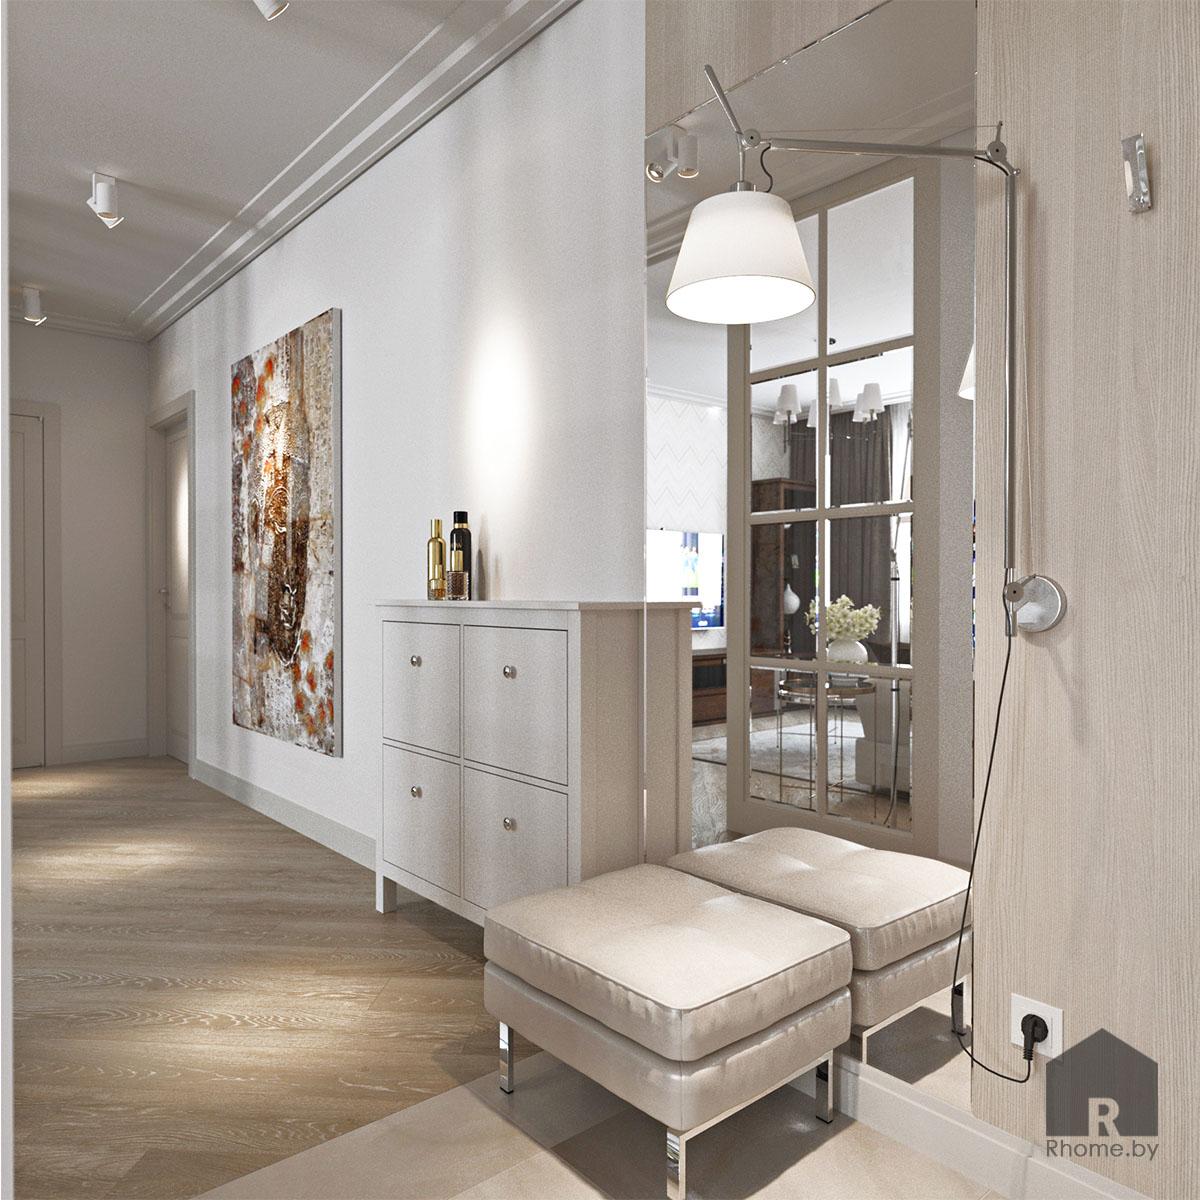 Дизайн интерьера коридора по ул. Белинского | Дизайн студия – Rhome.by